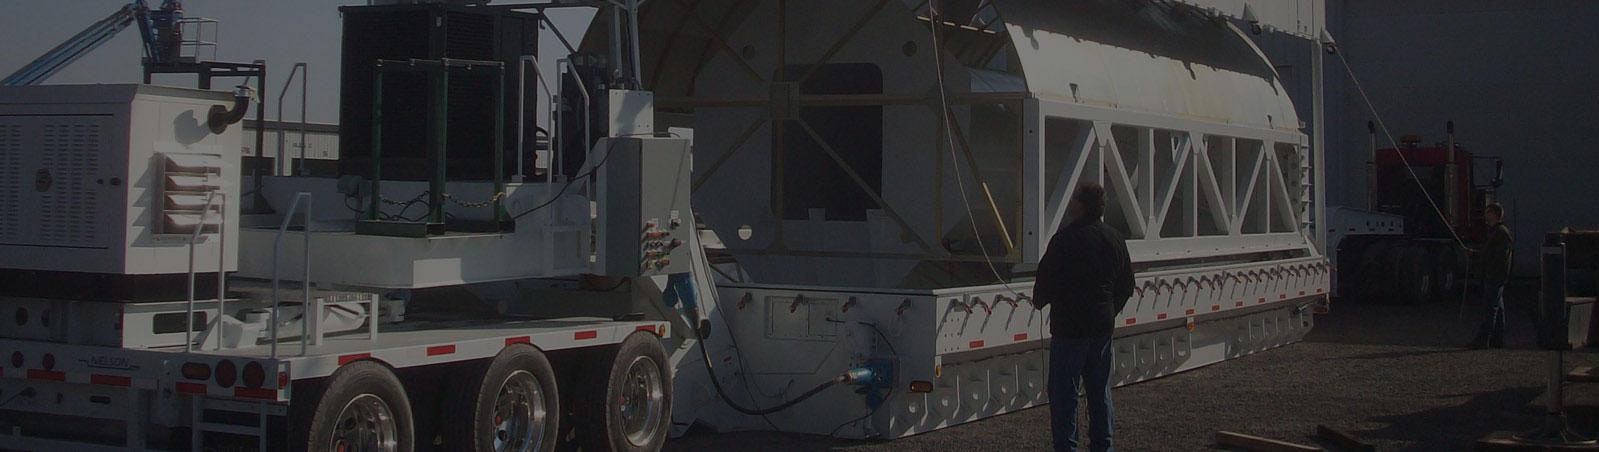 aerospace-trailer-bnr